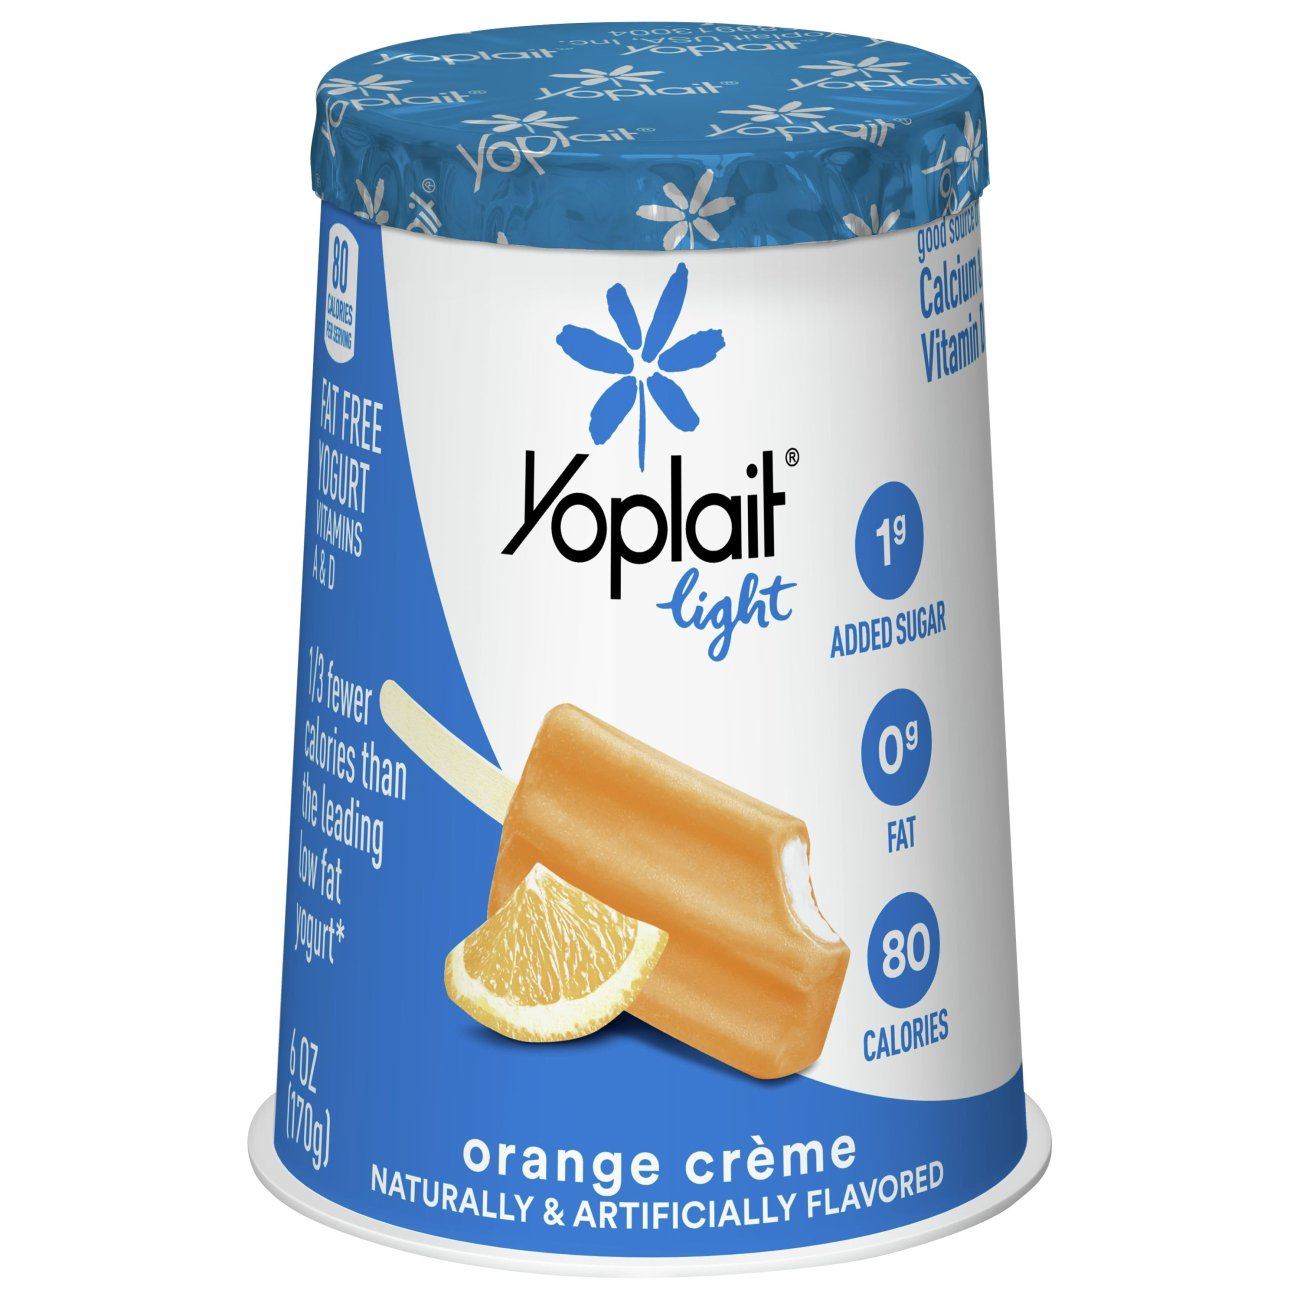 Yoplait Light Fat Free Yogurt, Orange